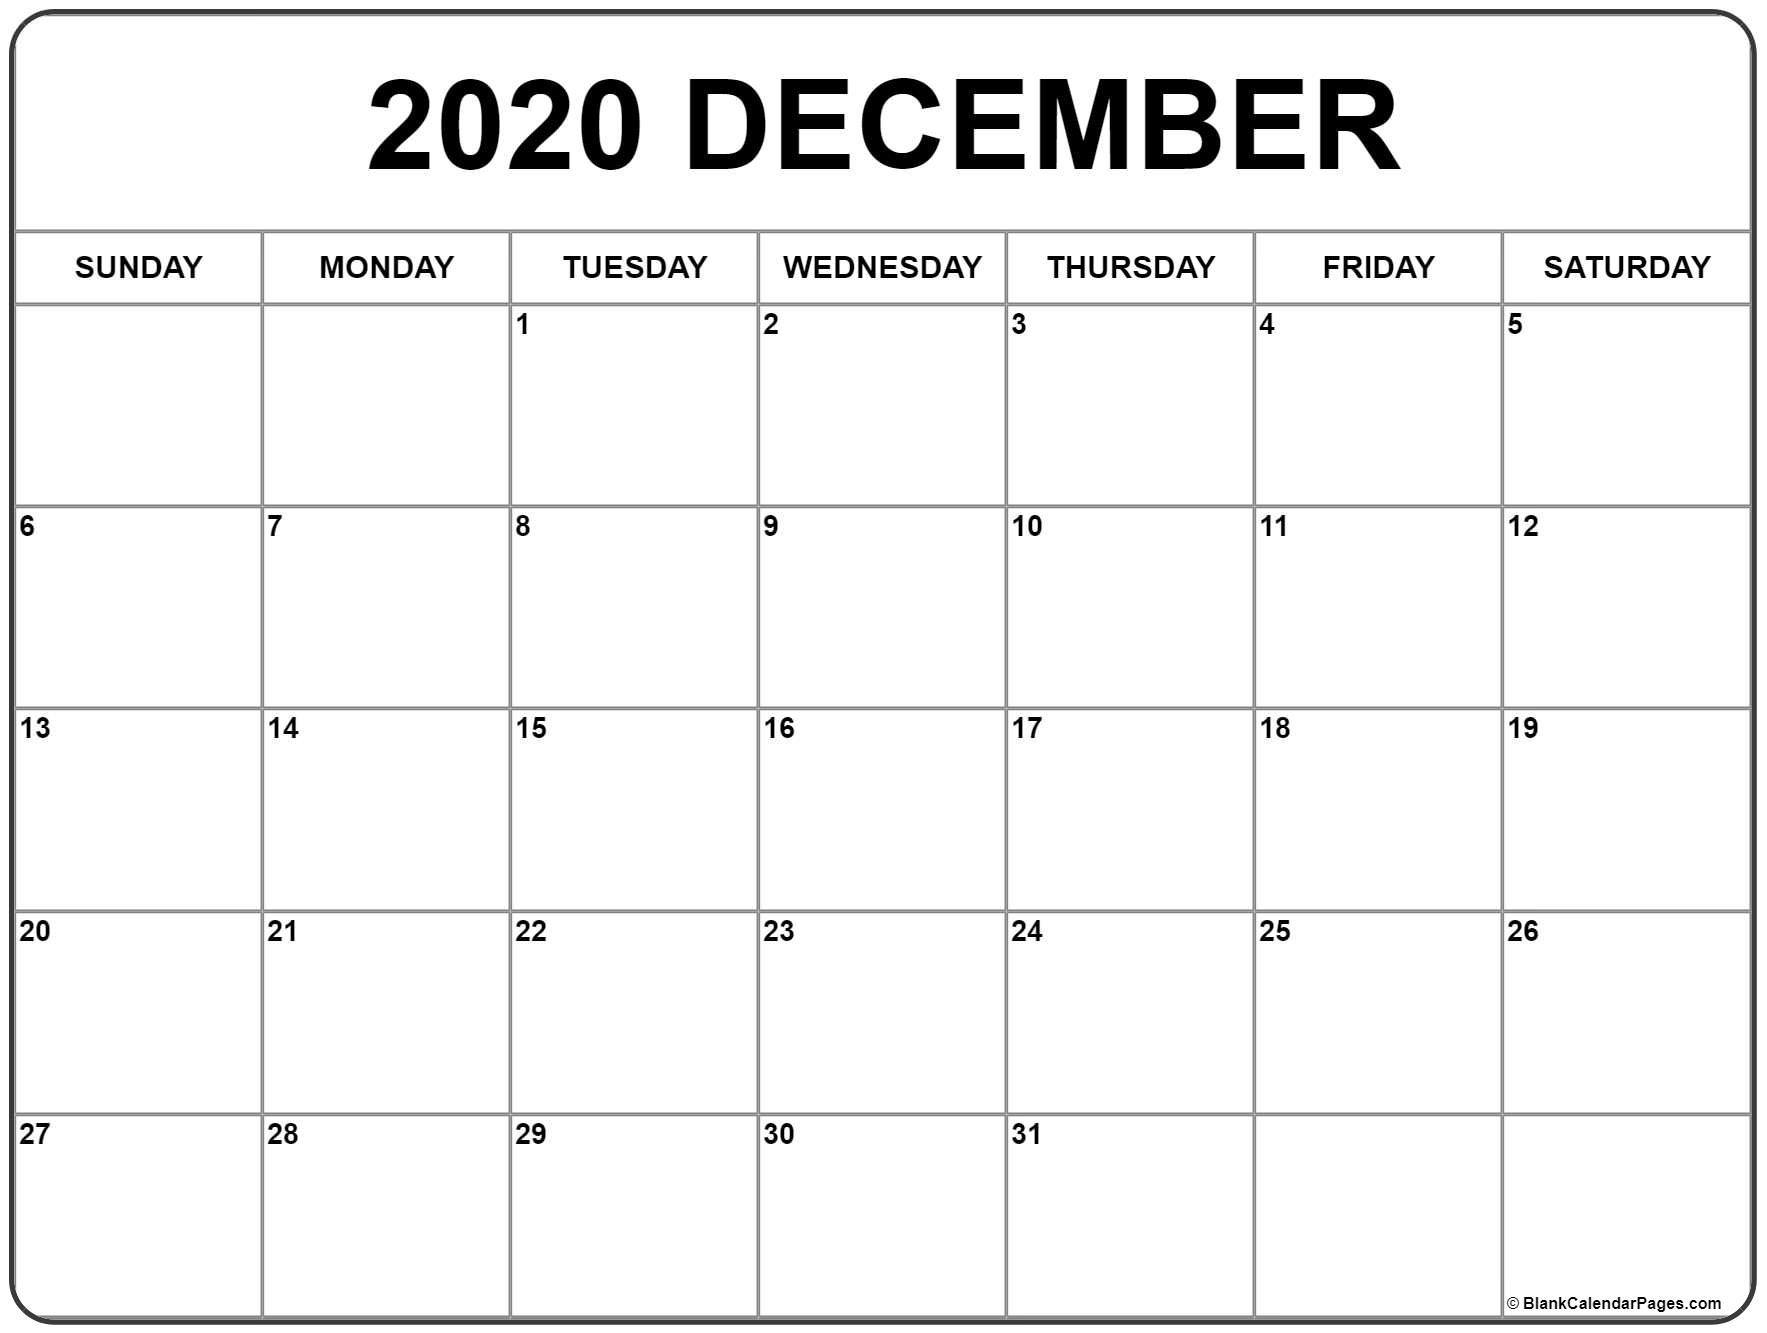 December 2020 Printable Calendar Template #2020Calendars throughout Free Printable Fill In Calendars 2020